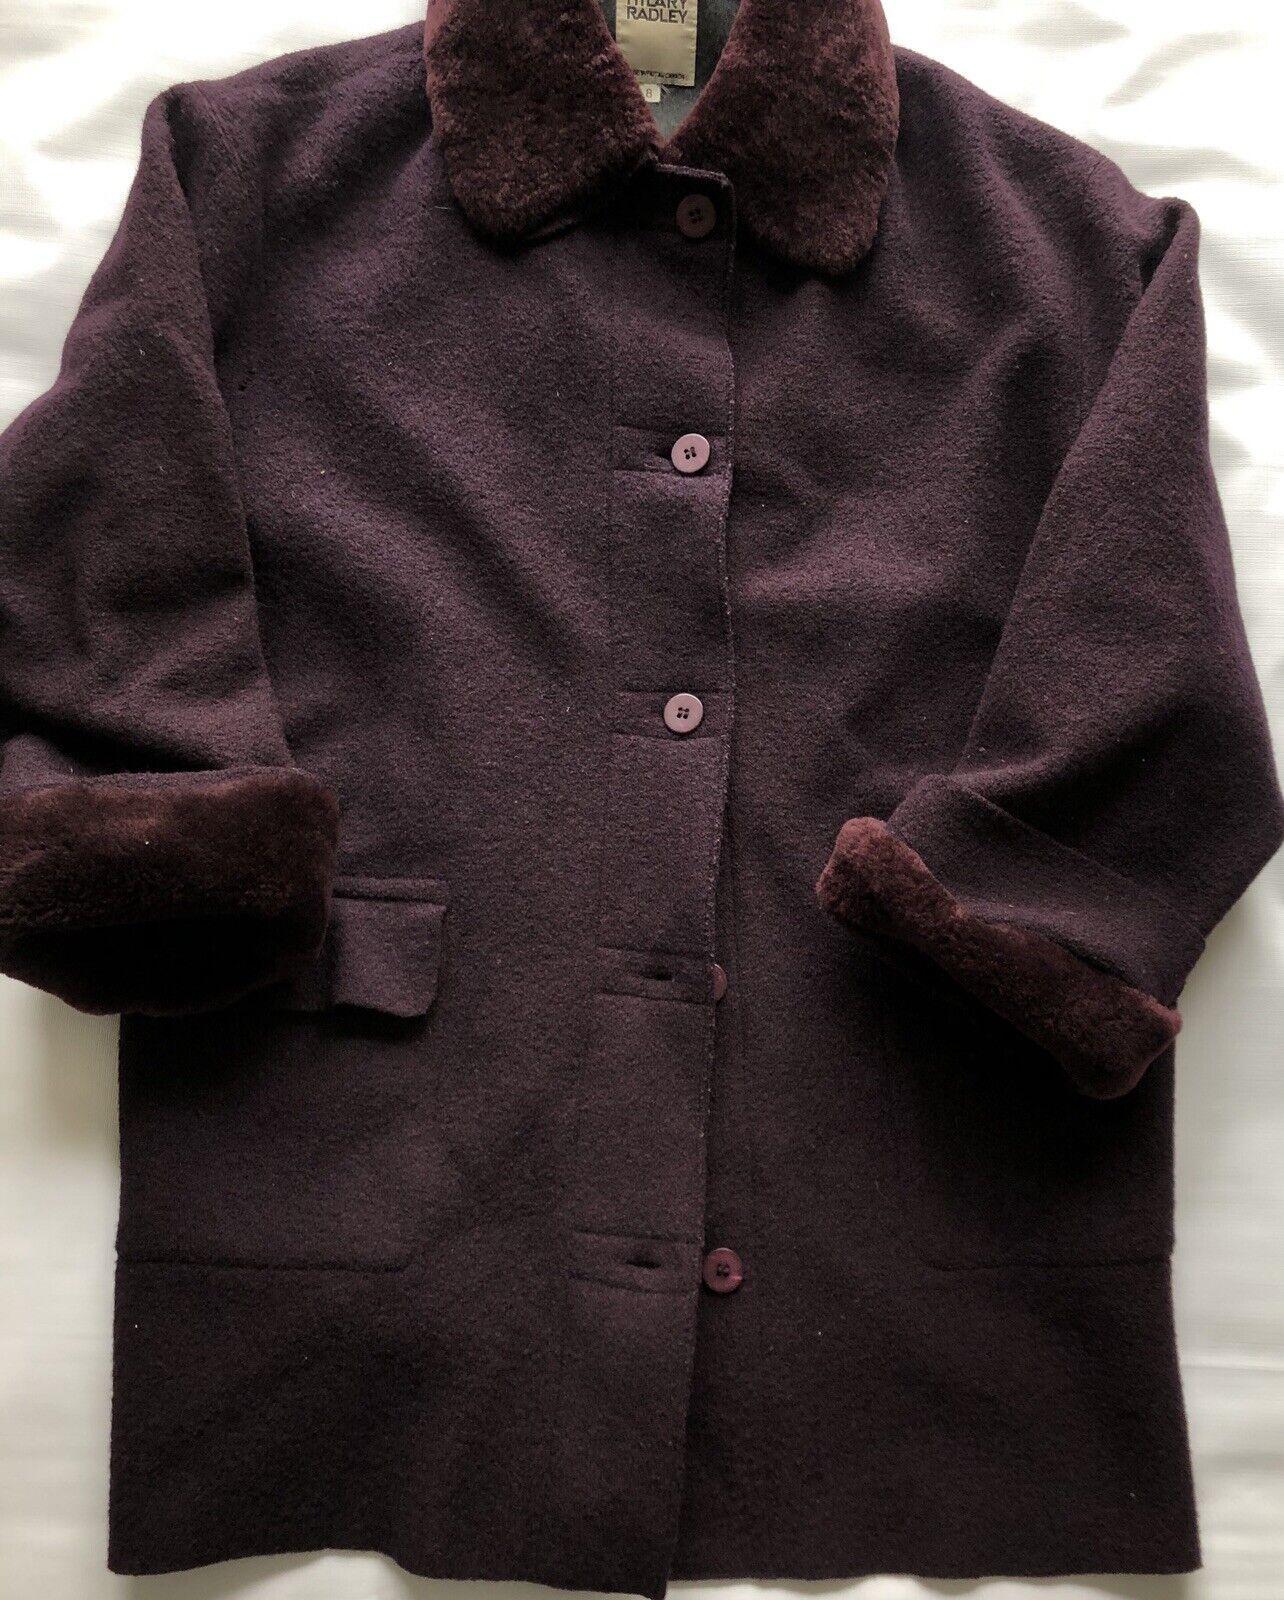 Hilary Radley Plum Purple Boiled Wool Coat Coat Coat Size 8 w  Full Lining Faux Fur Trim 33465c